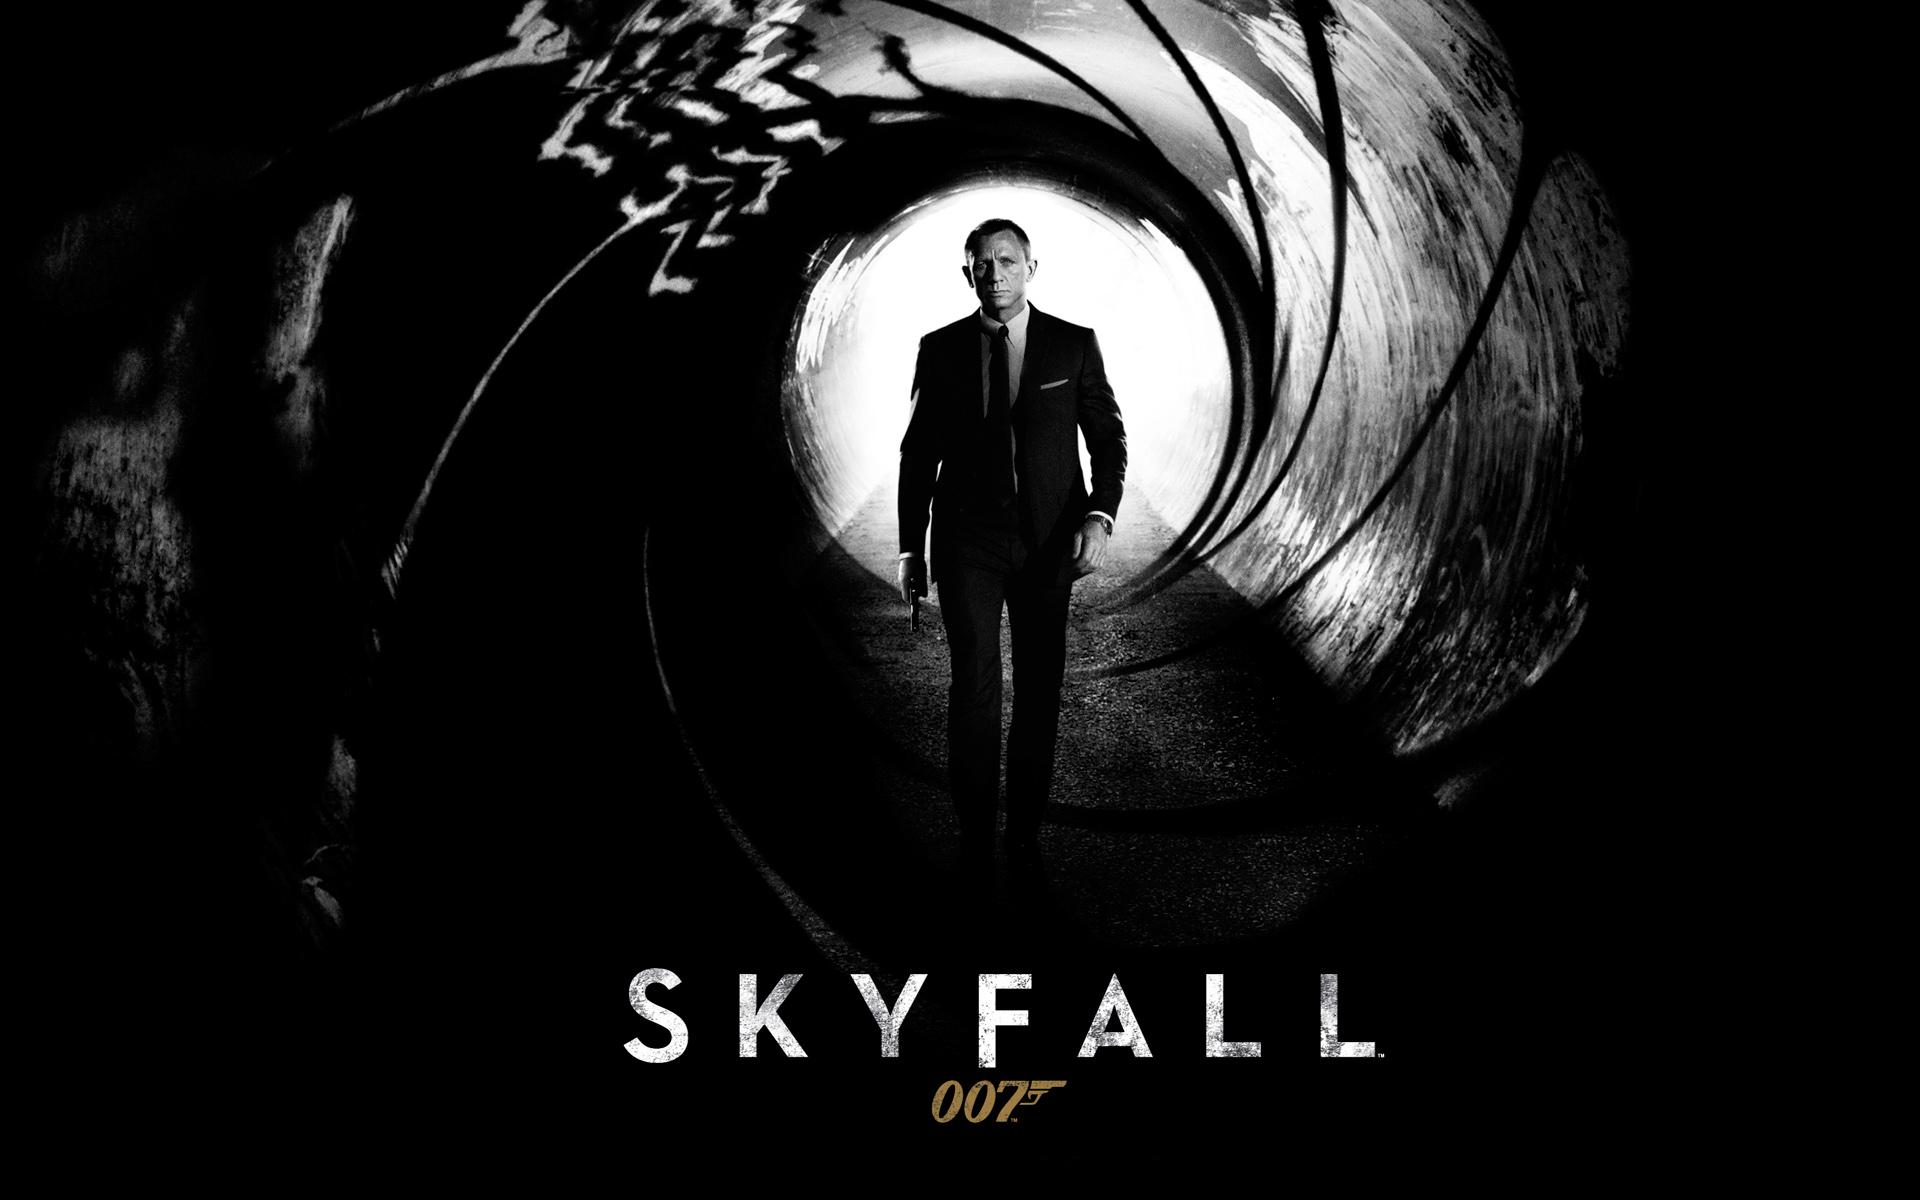 Skyfall 2012 Movie wallpaper